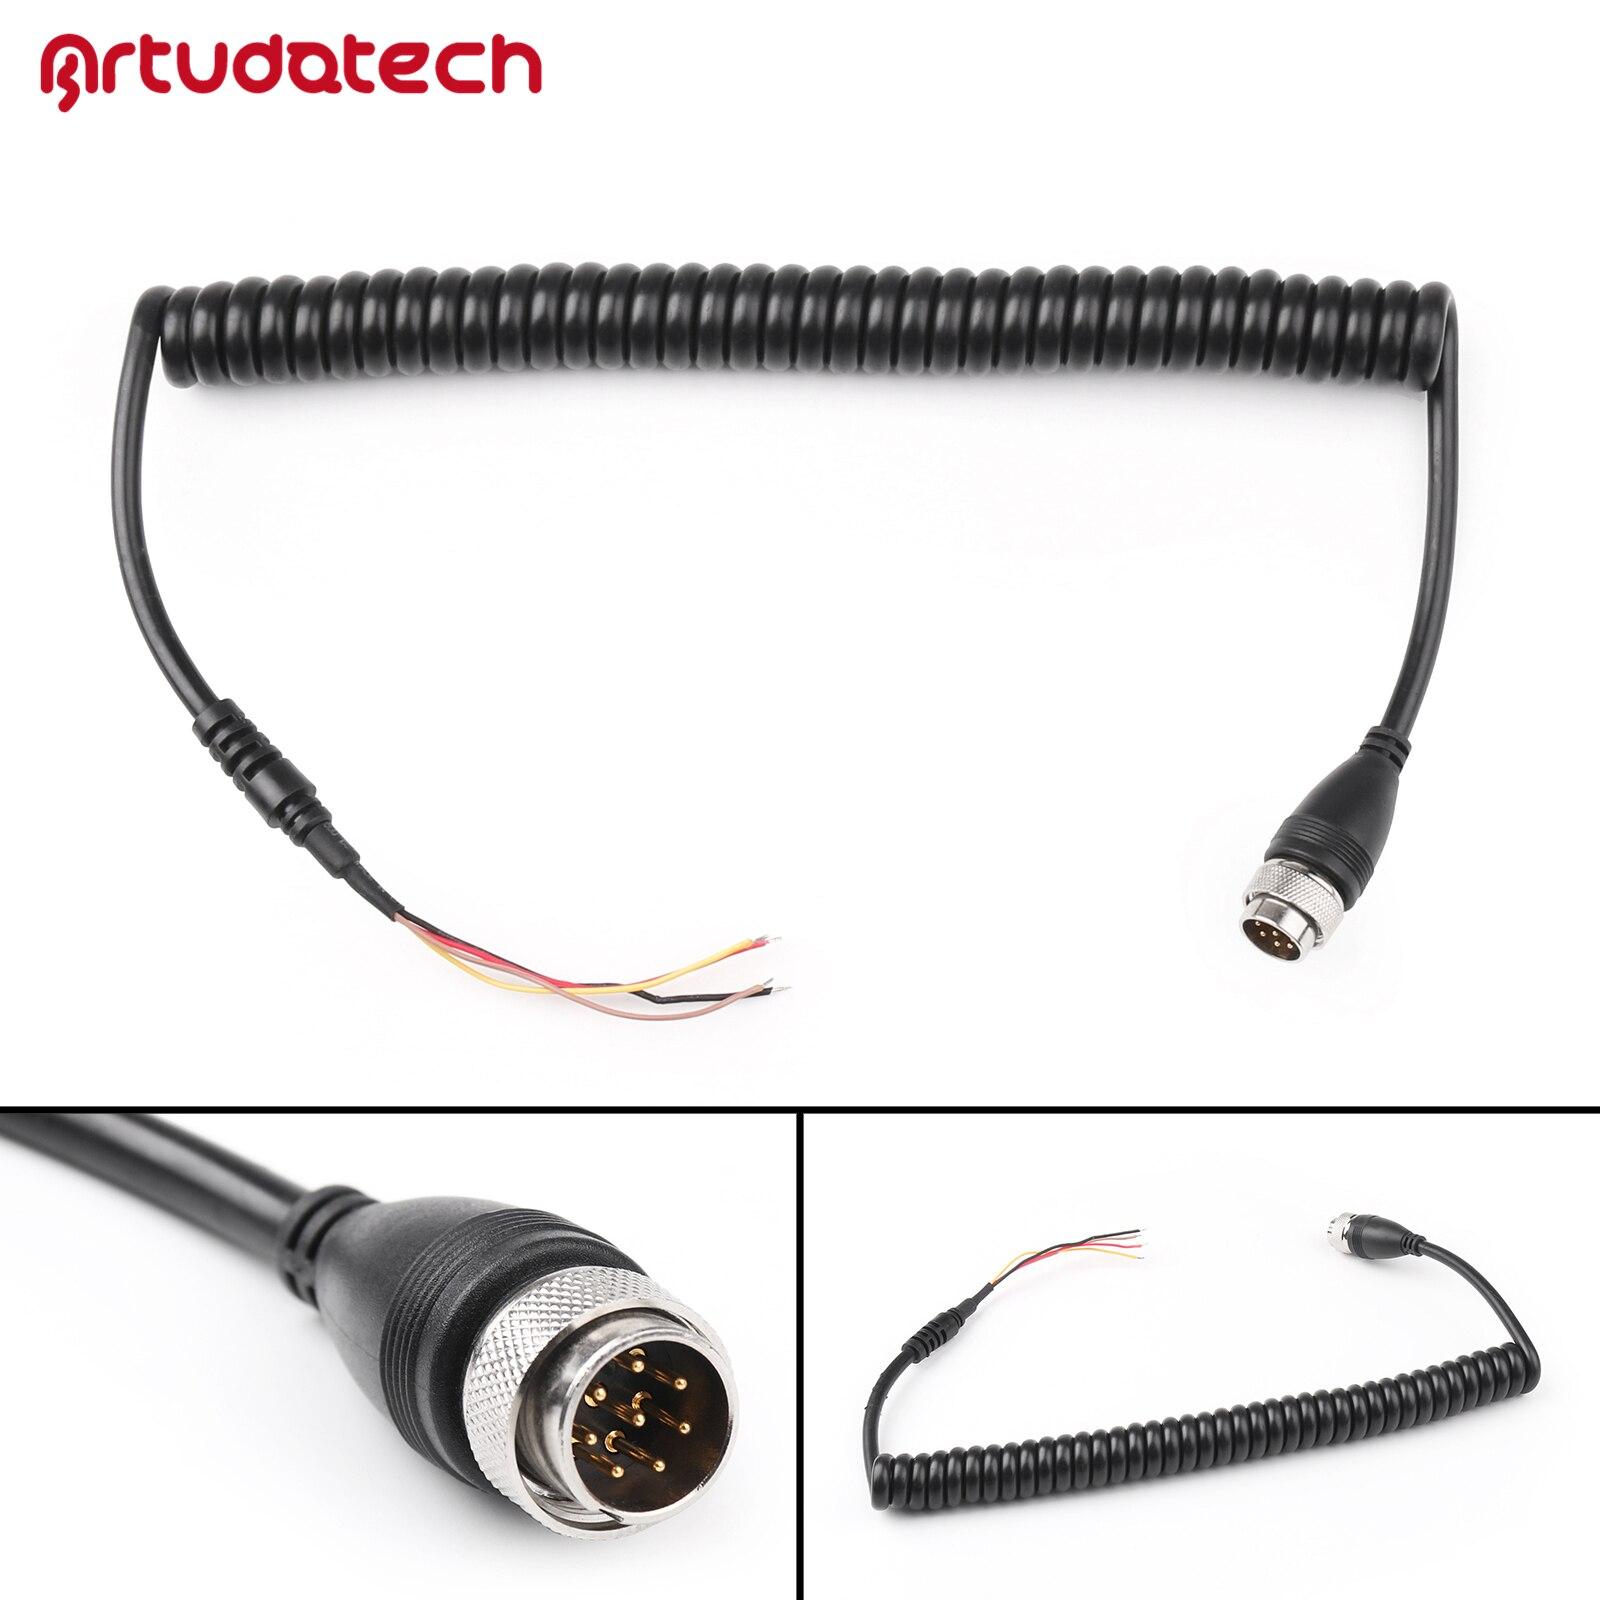 Artudatech Mic Microphone Cable Line For ICOM Radio M710 M700 M700Pro To HM-180 EM-101